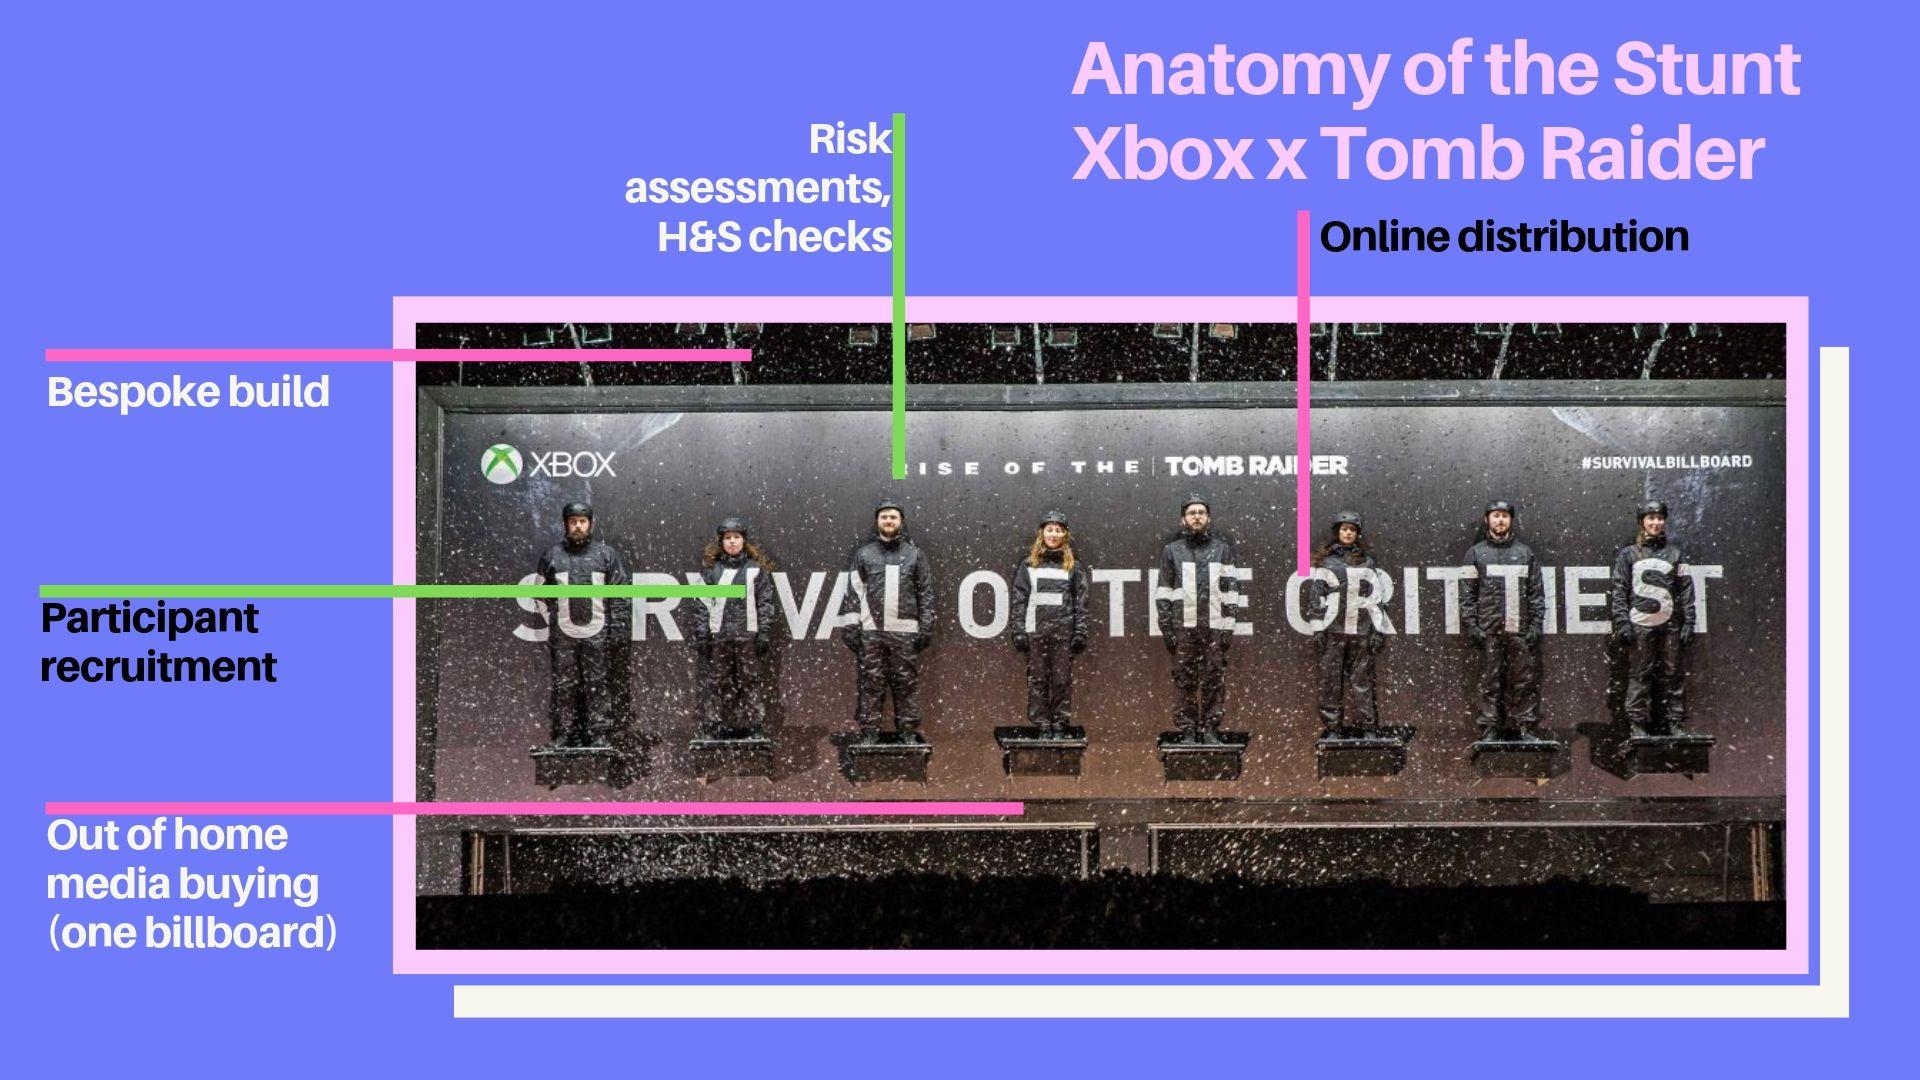 gaming-marketing-pr-stunt-activity-xbox-tomb-raider.jpg